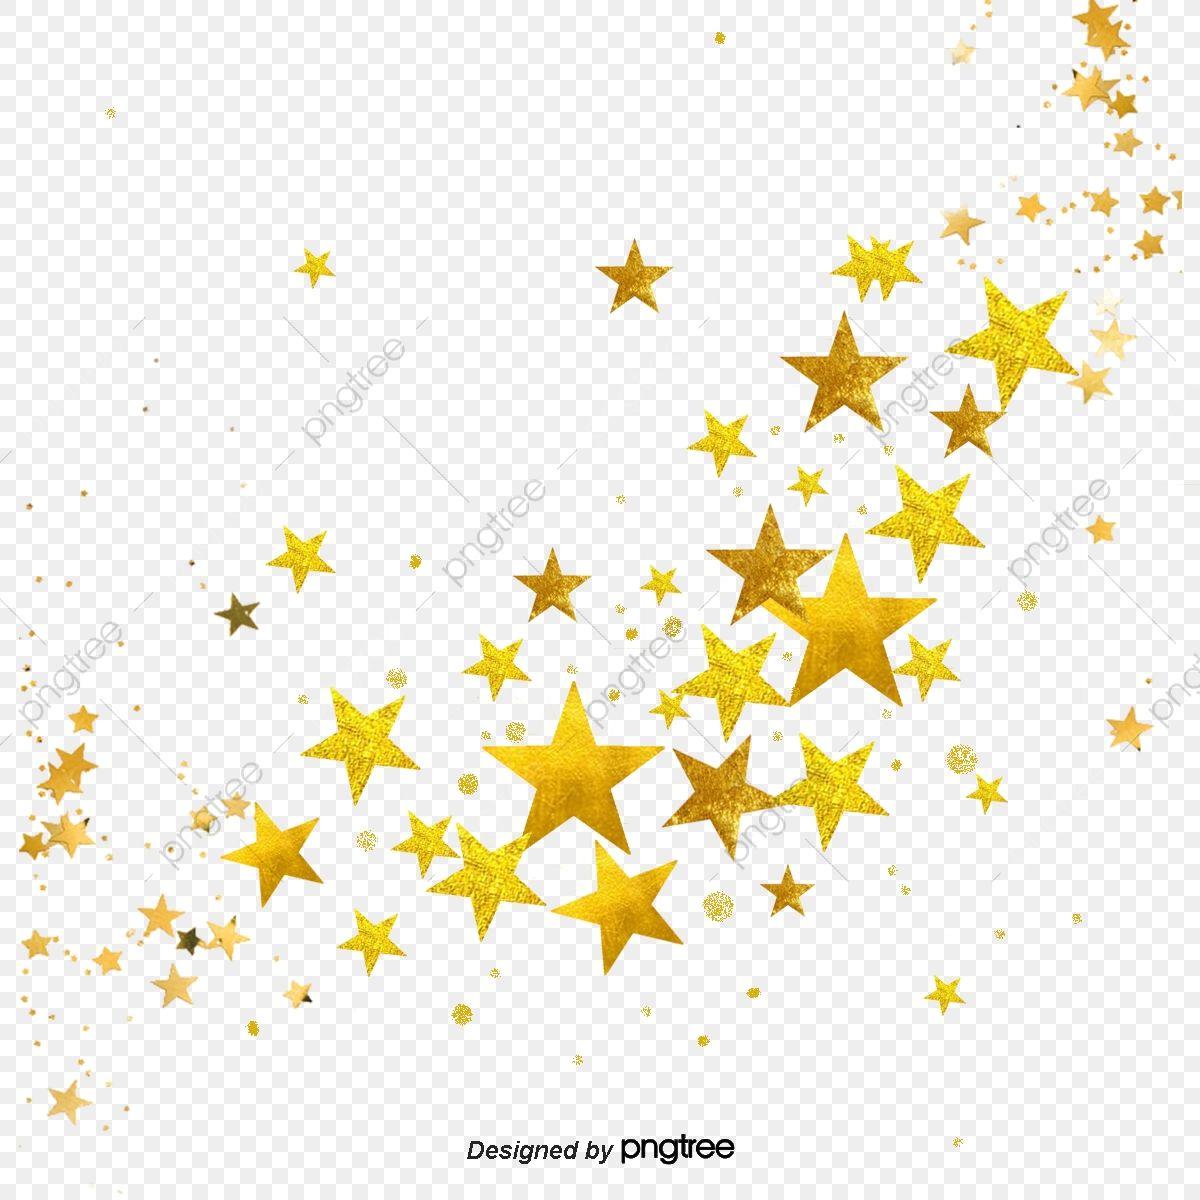 Irregular Combination Of Bright Golden Stars Gold Clipart Irregular Shape Aestheticism Png Transparent Clipart Image And Psd File For Free Download Background Banner Golden Star Prints For Sale